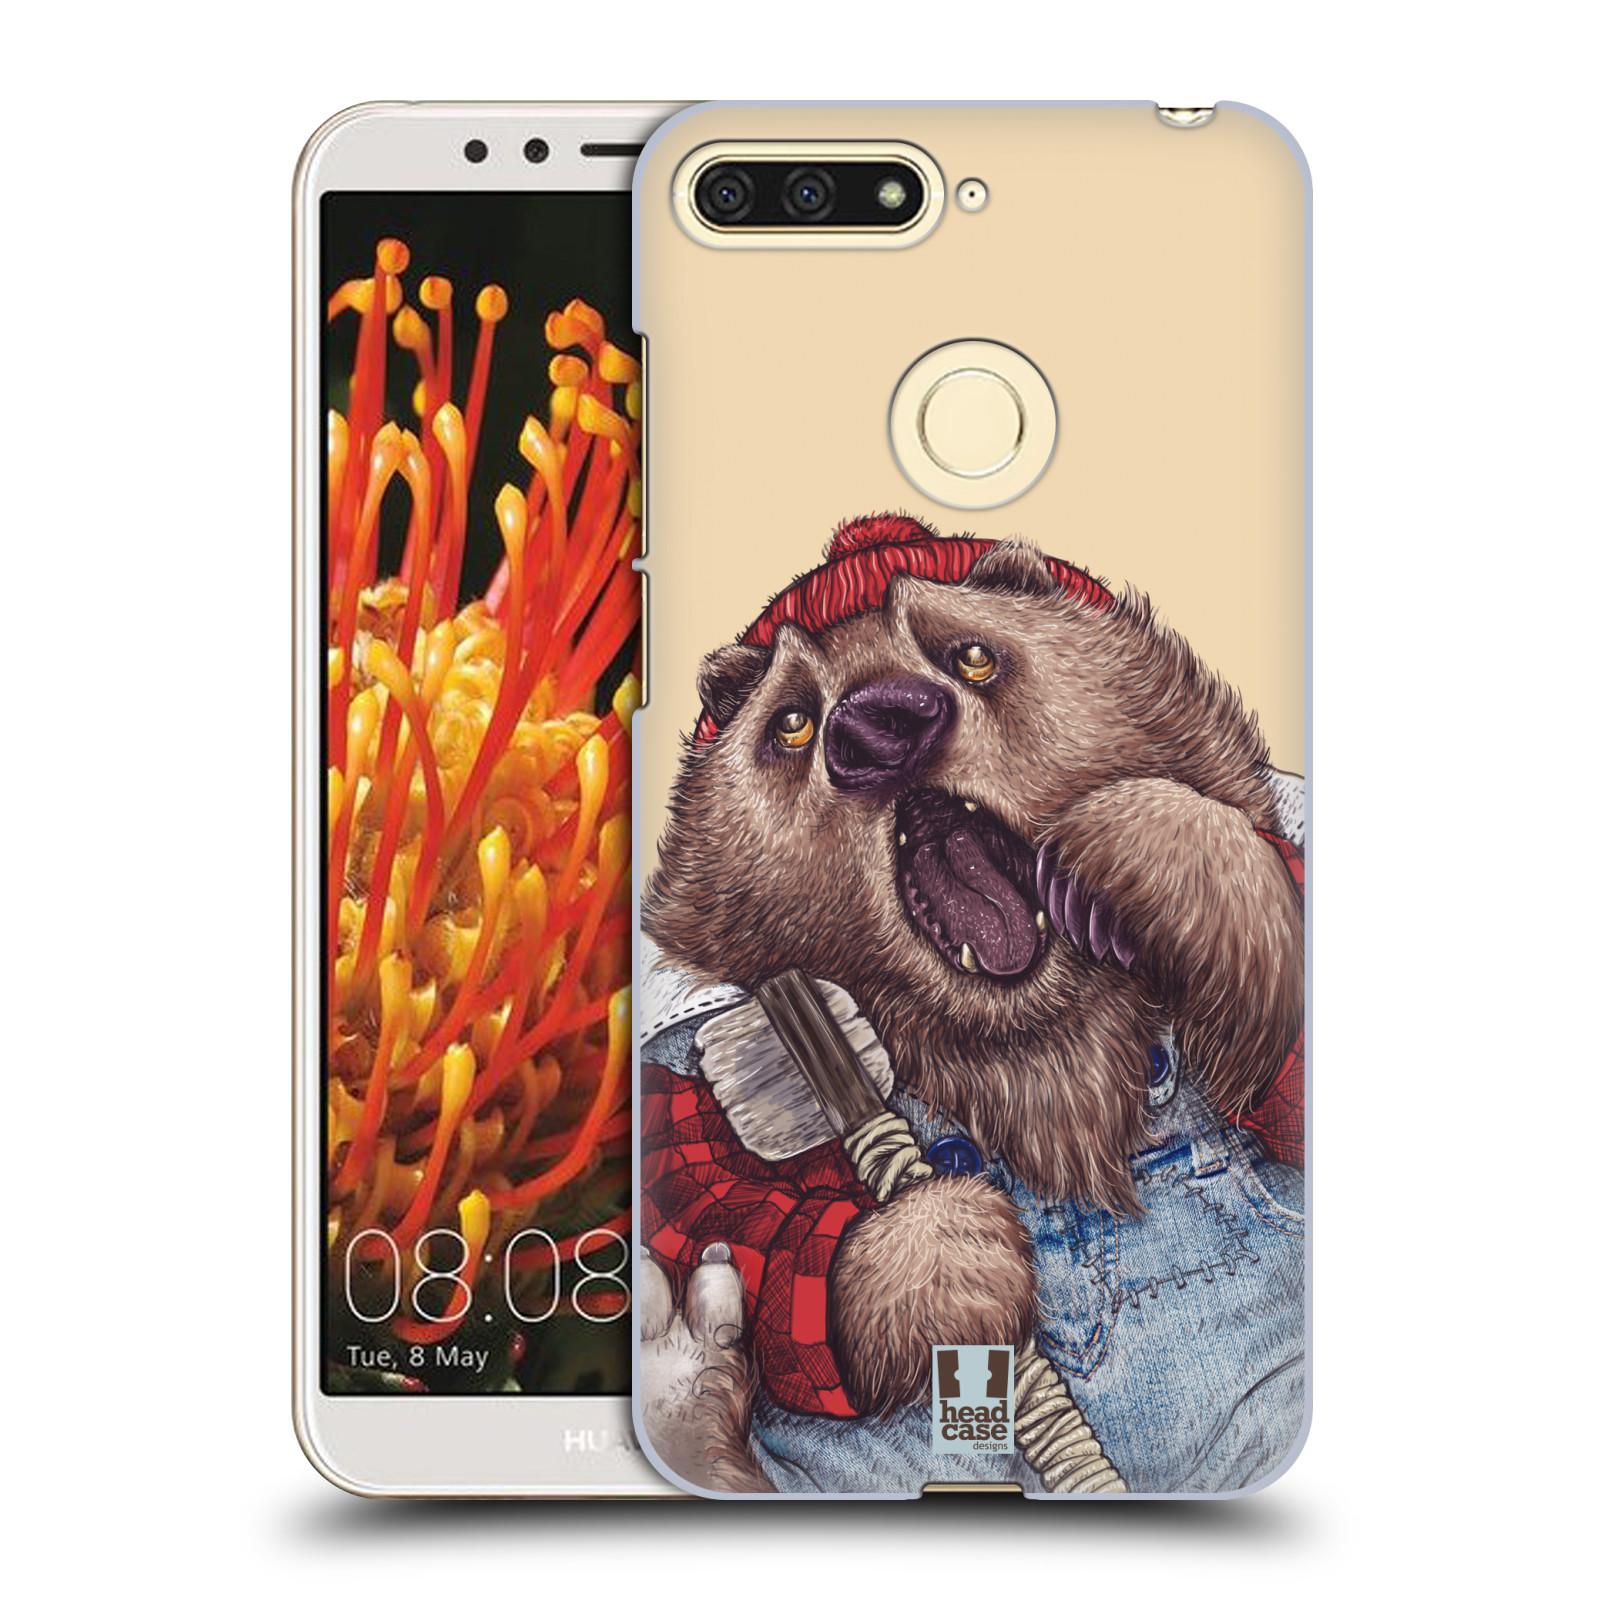 Plastové pouzdro na mobil Huawei Y6 Prime 2018 - Head Case - ANIMPLA MEDVĚD